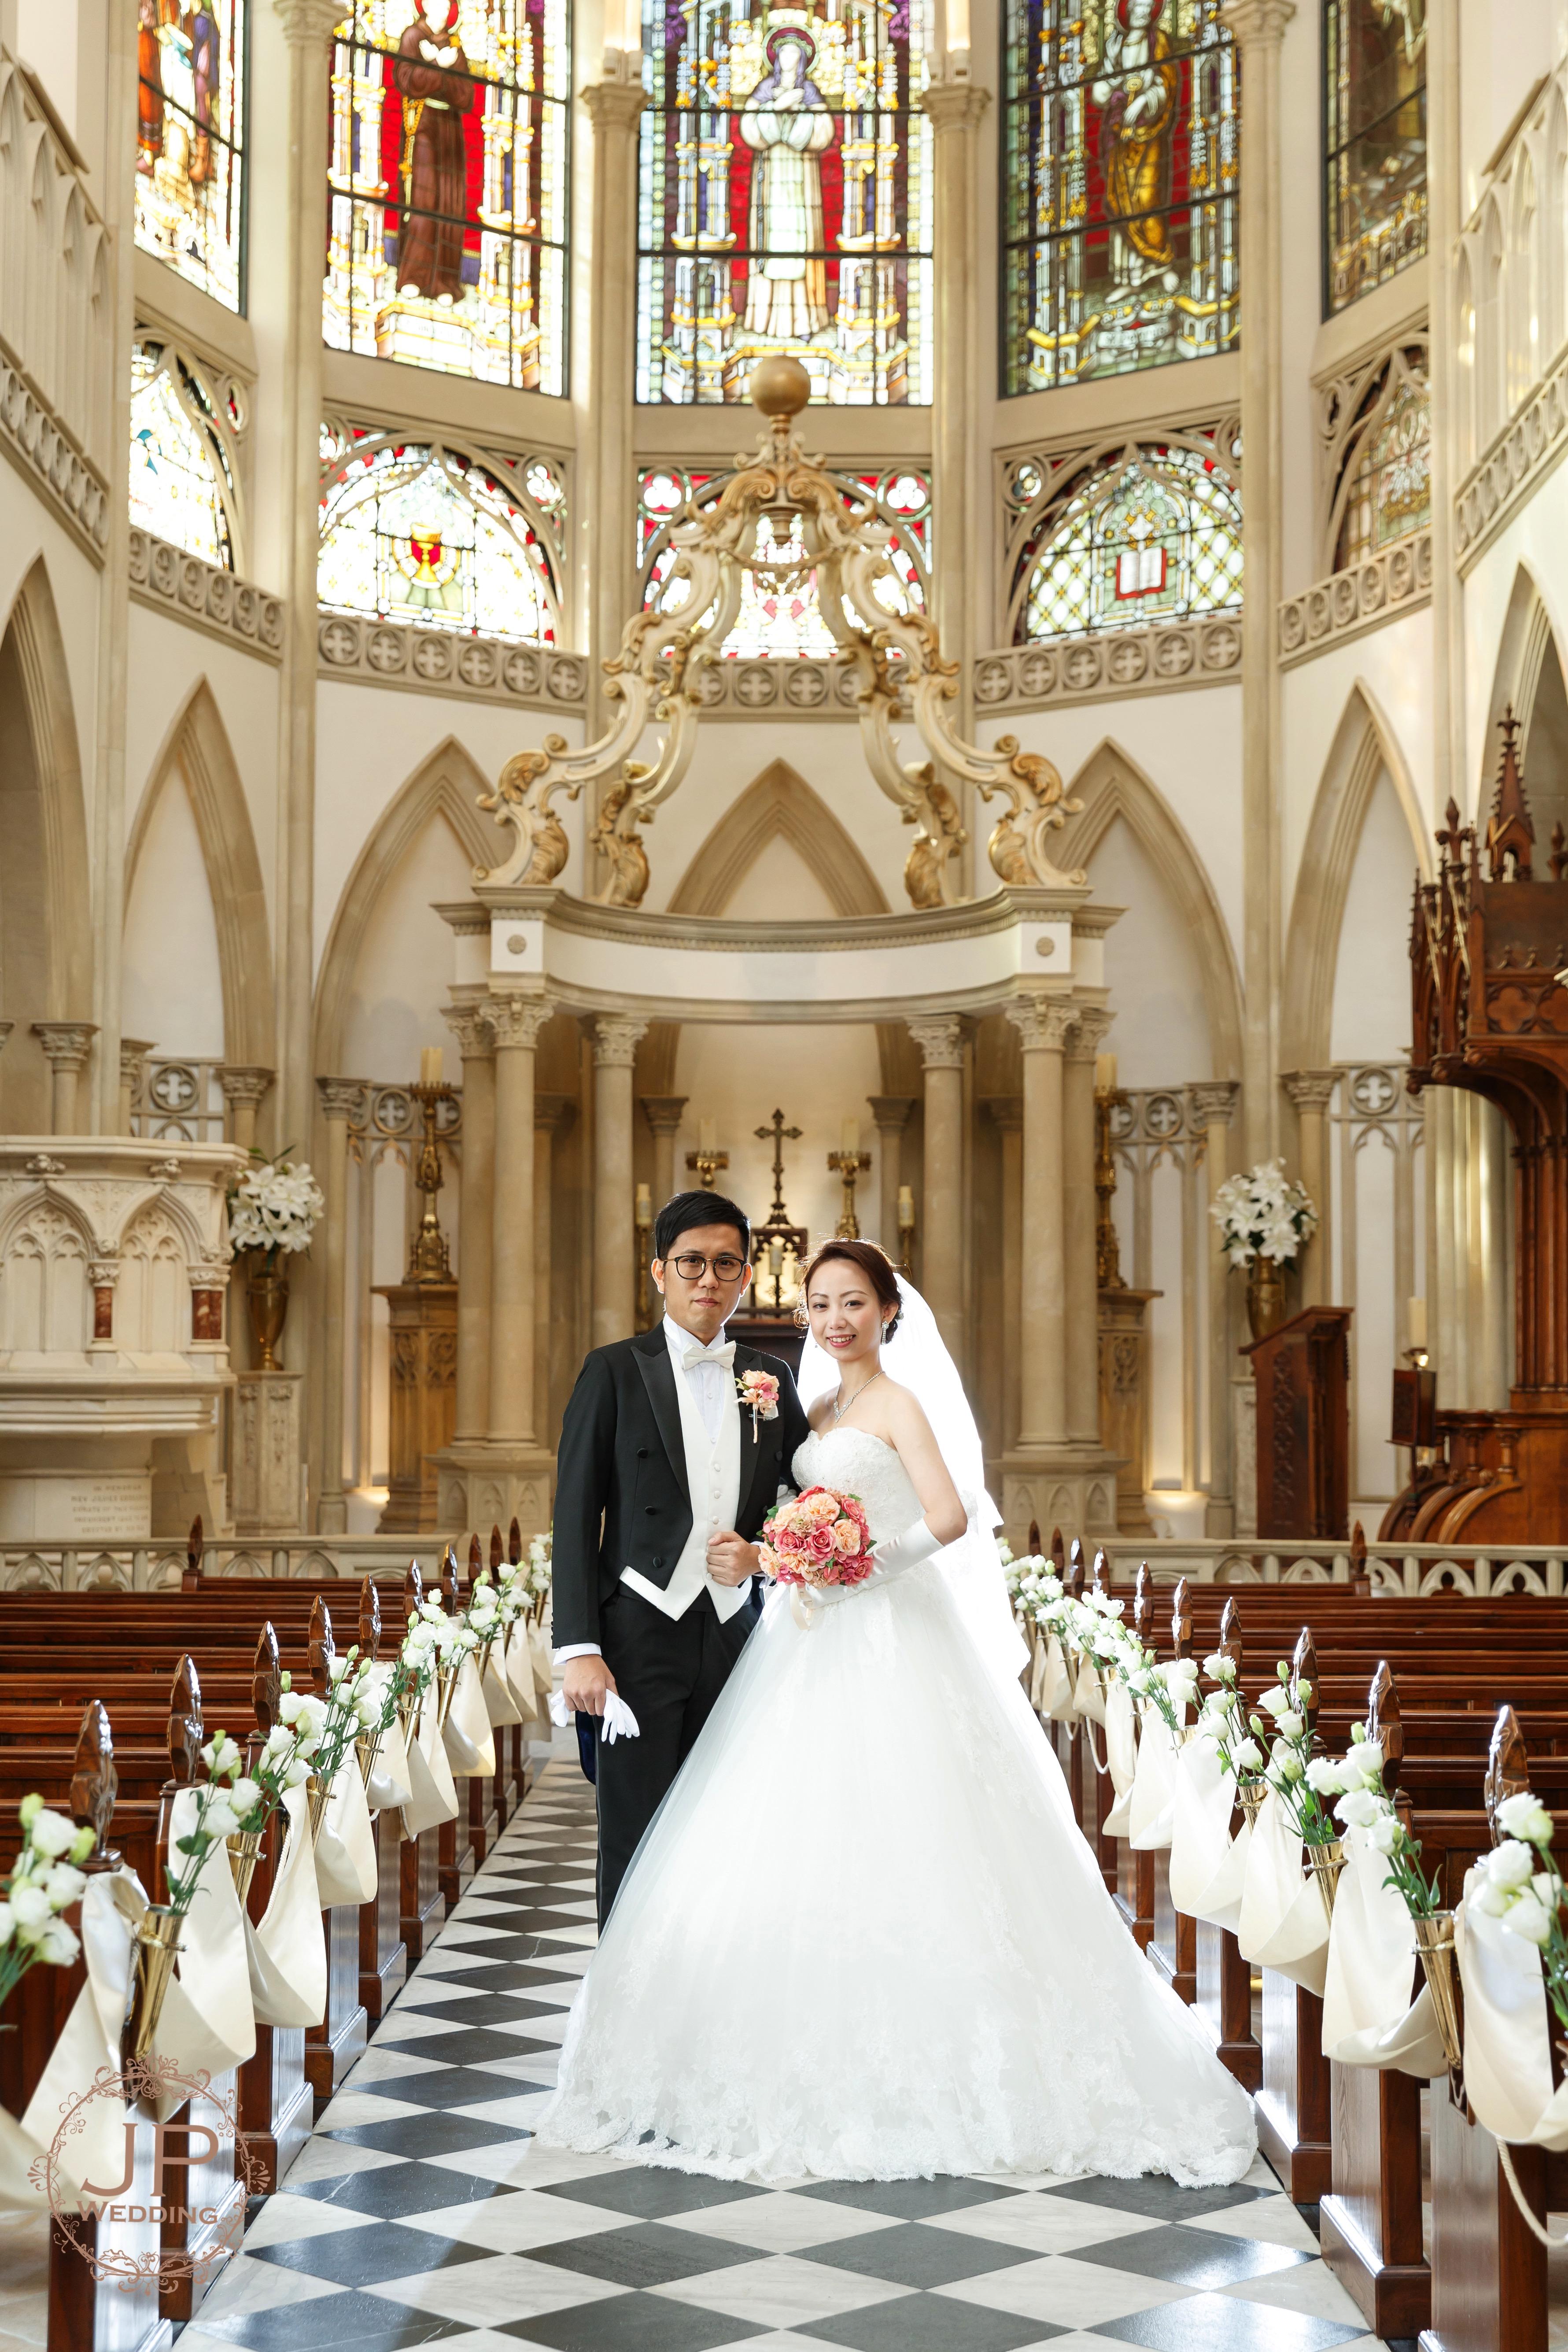 JP Wedding HK, Nagoya Glastonia 2018-23